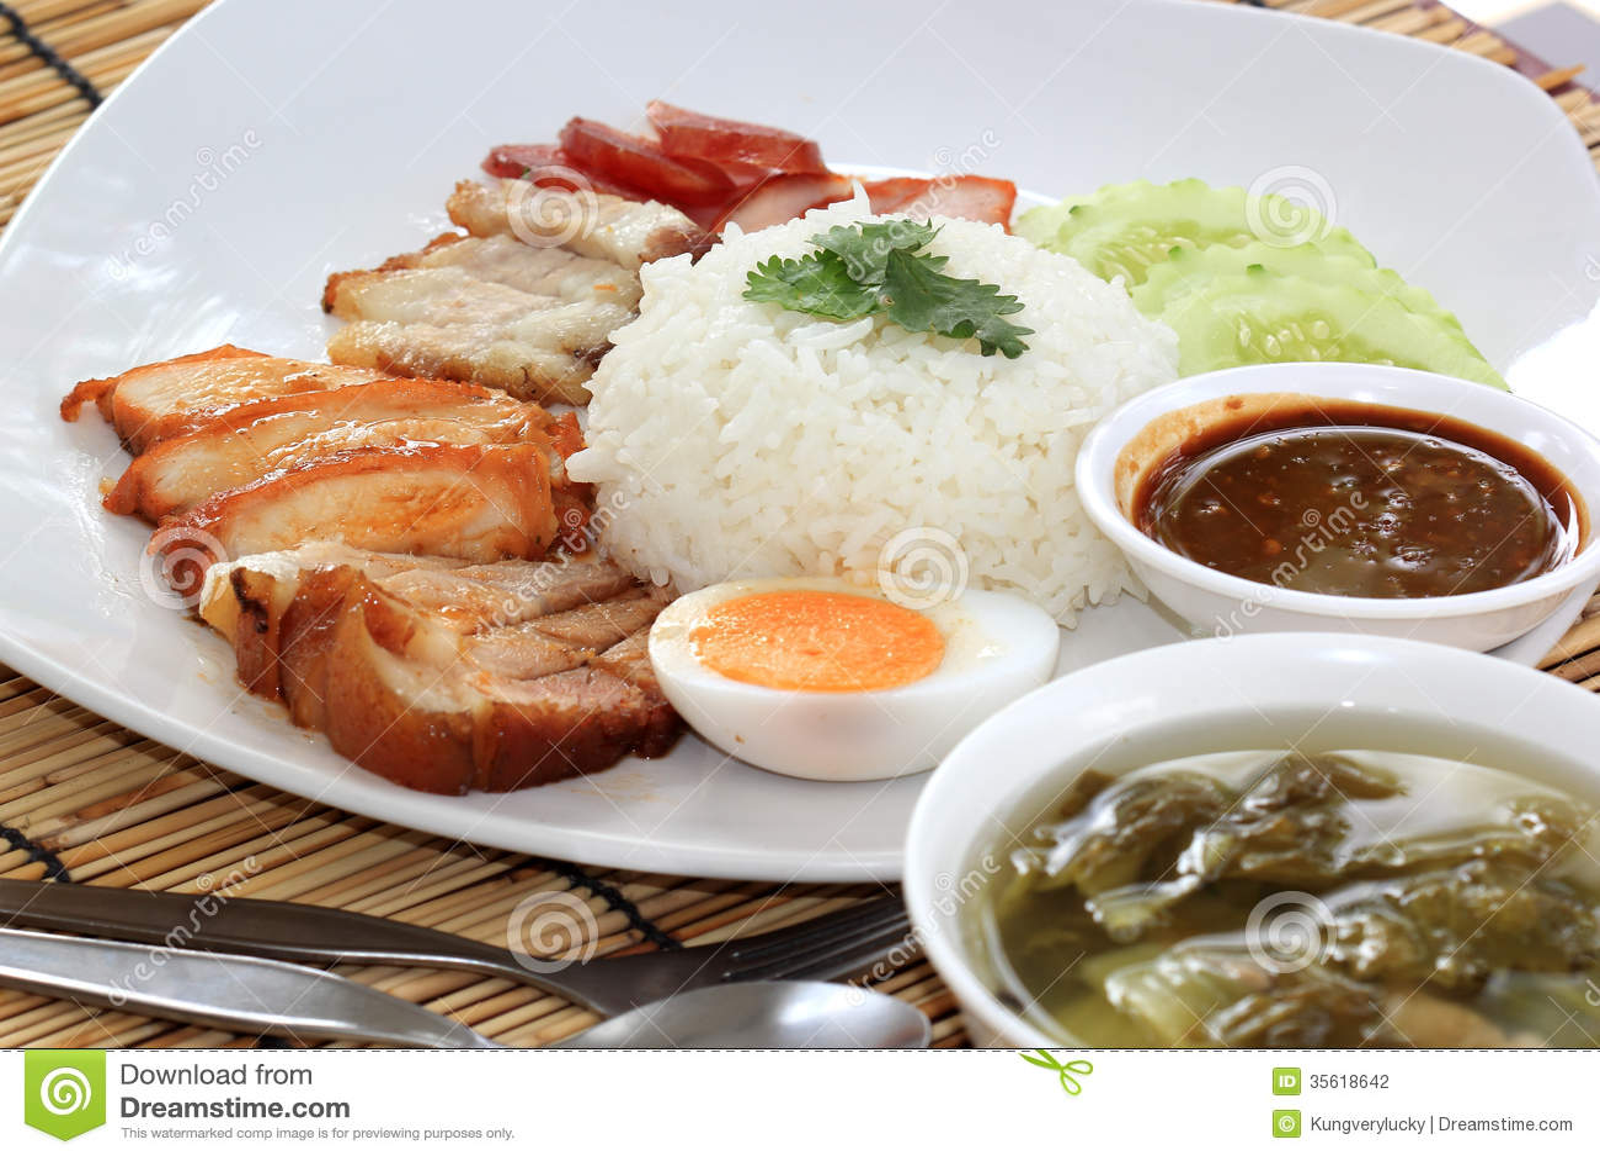 ... over-steam-rice-roast-chicken-pork-fried-ferment-pork-crispy-pork